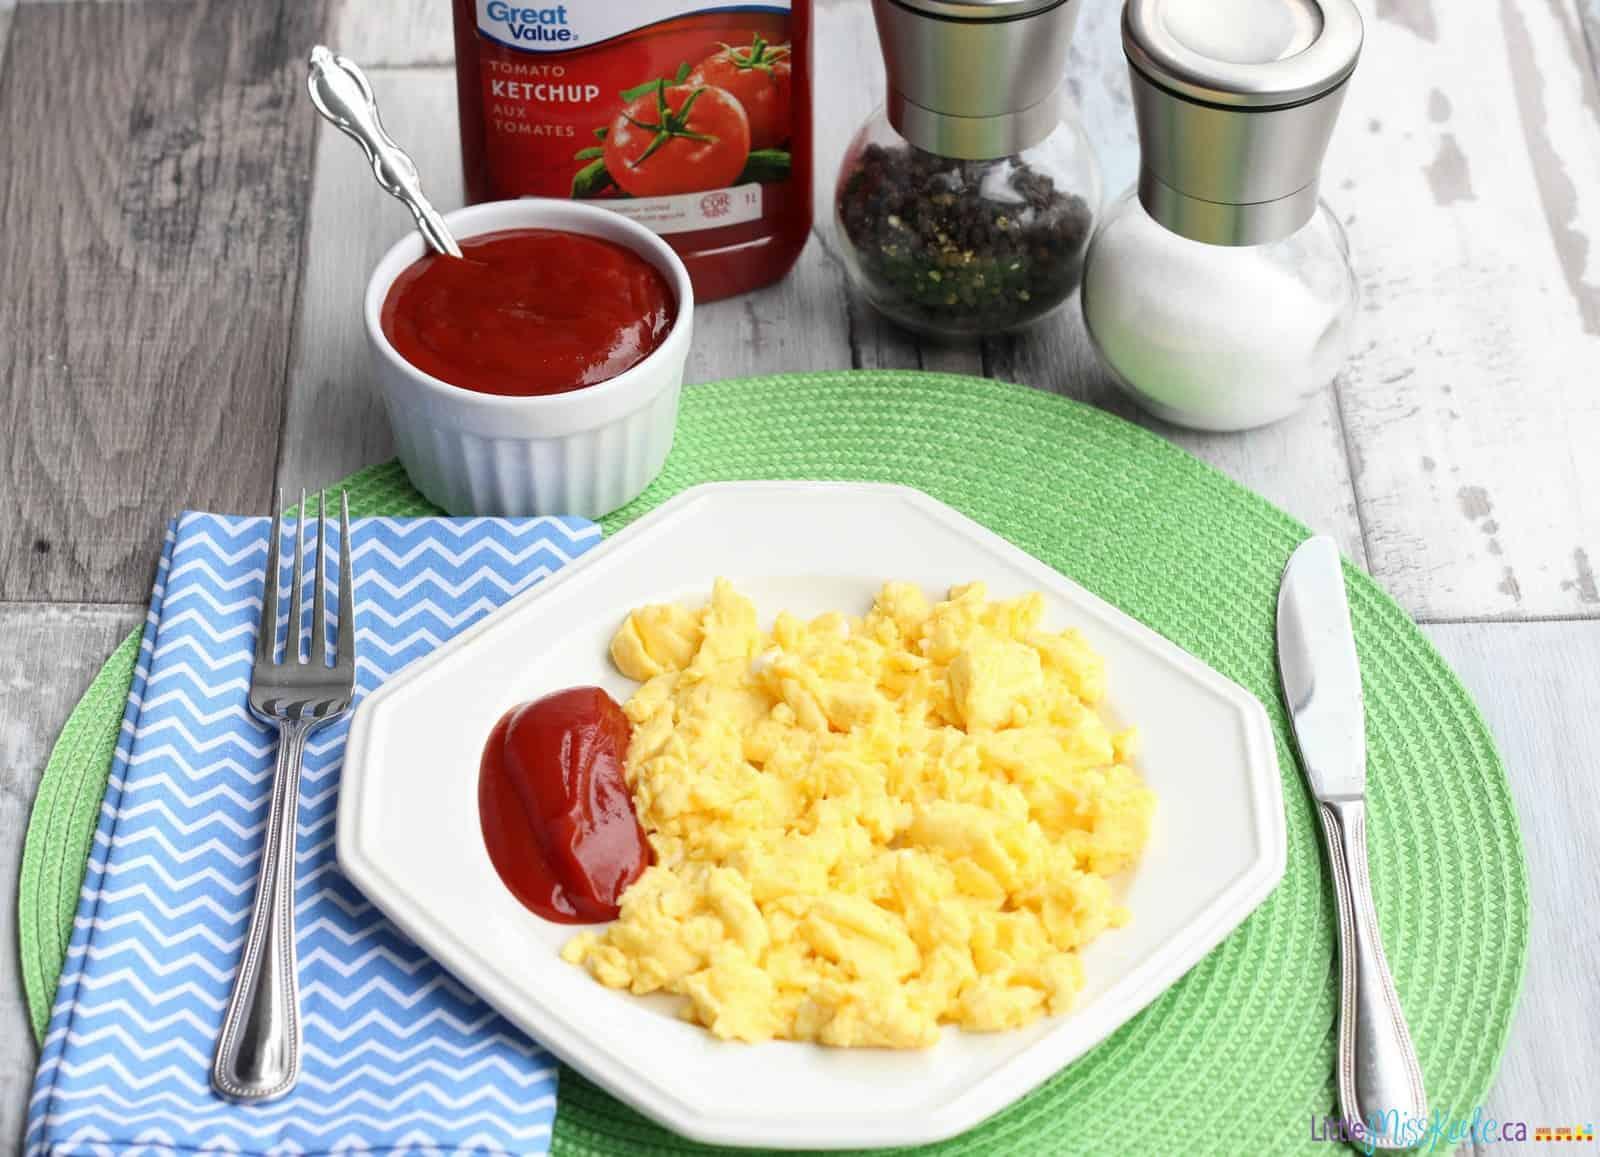 Homemade Bloody Caesar Ketchup recipe via littlemisskate.ca